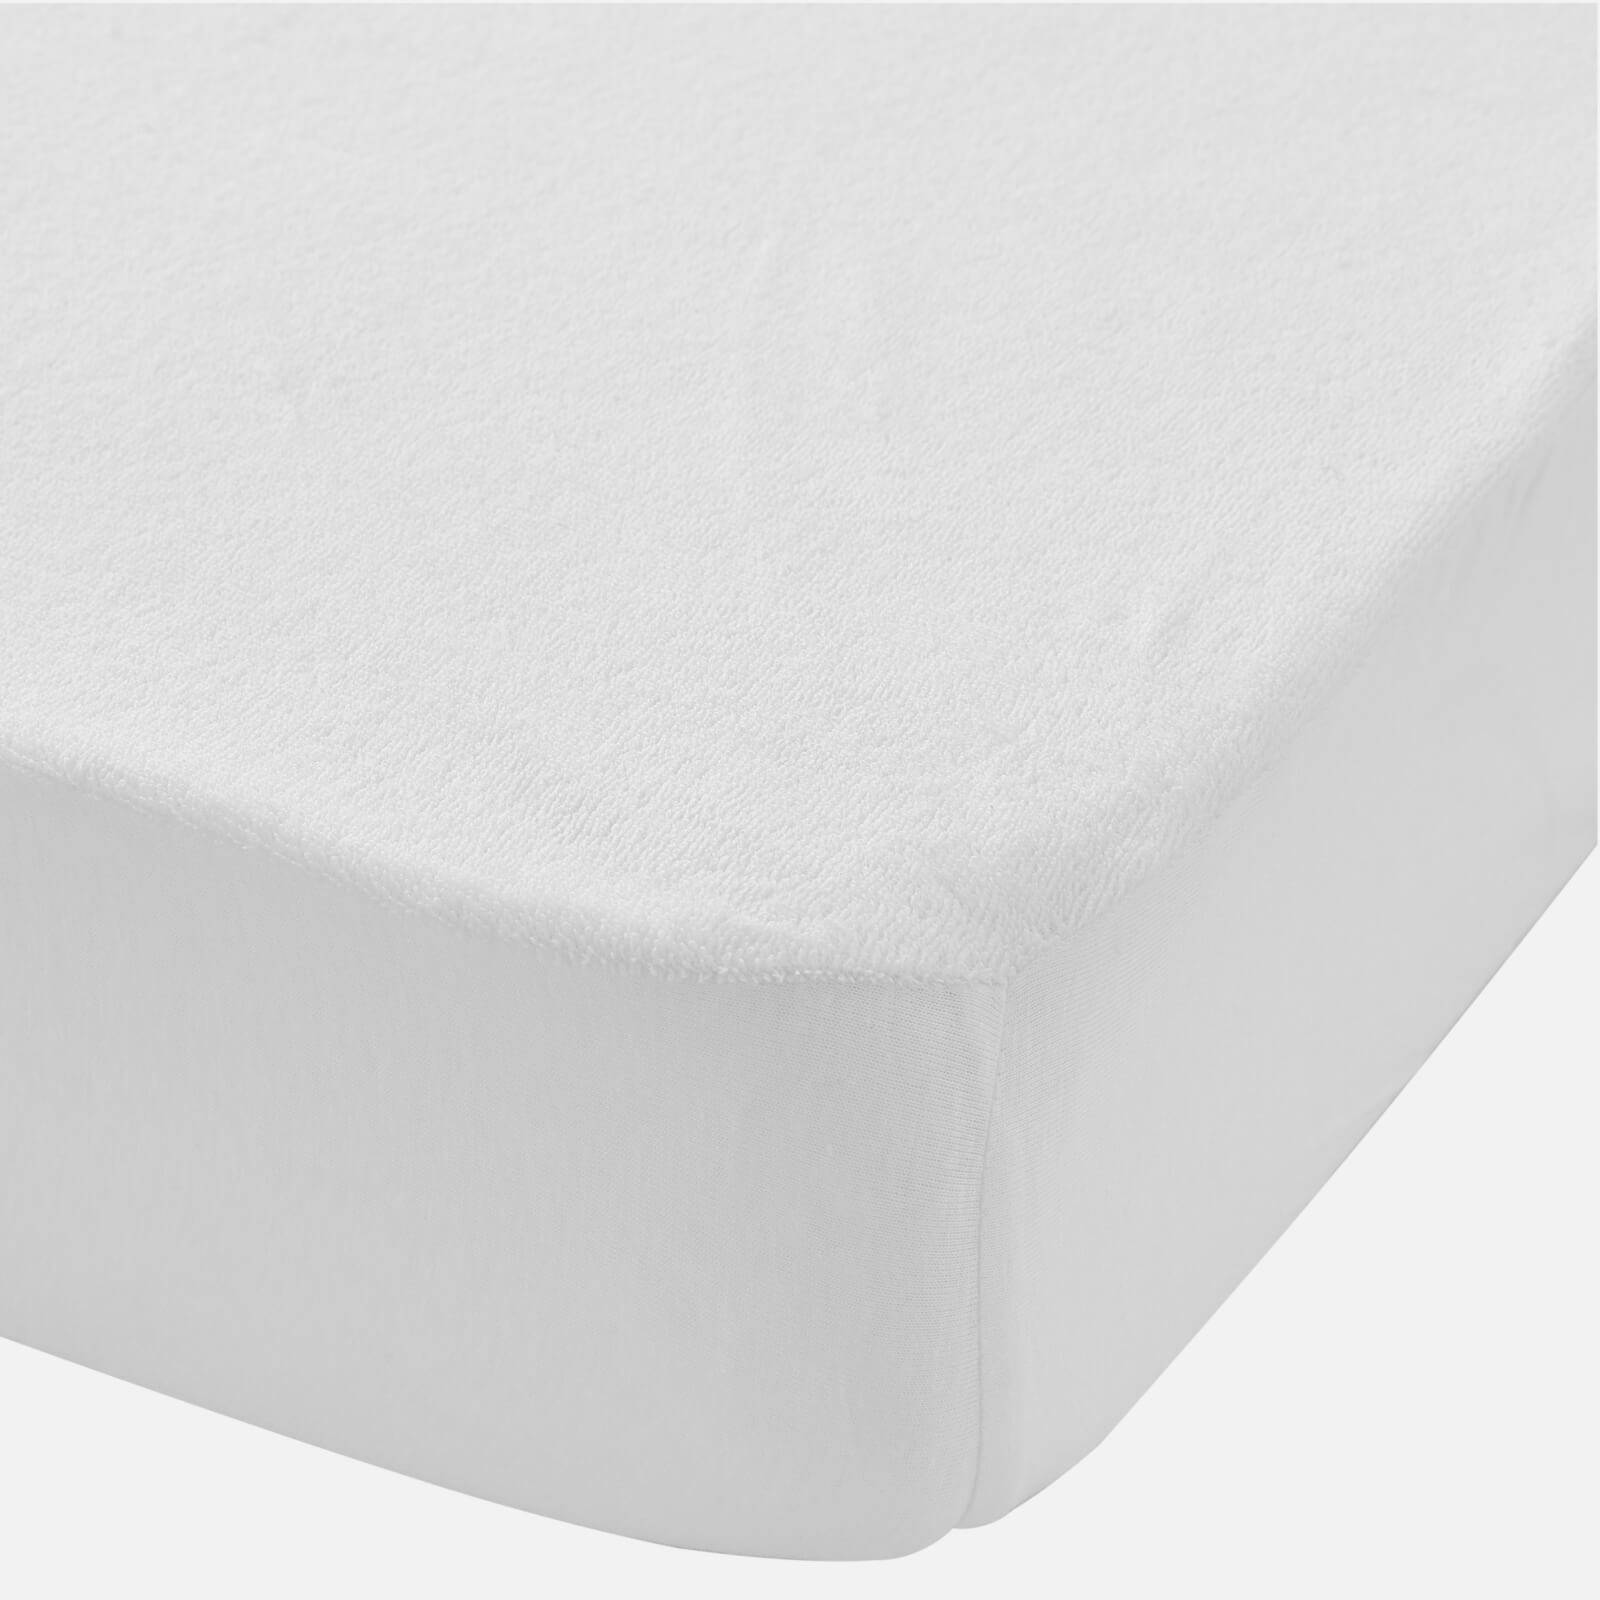 in homeware Waterproof Terry Baby Mattress Protector - White - Cot